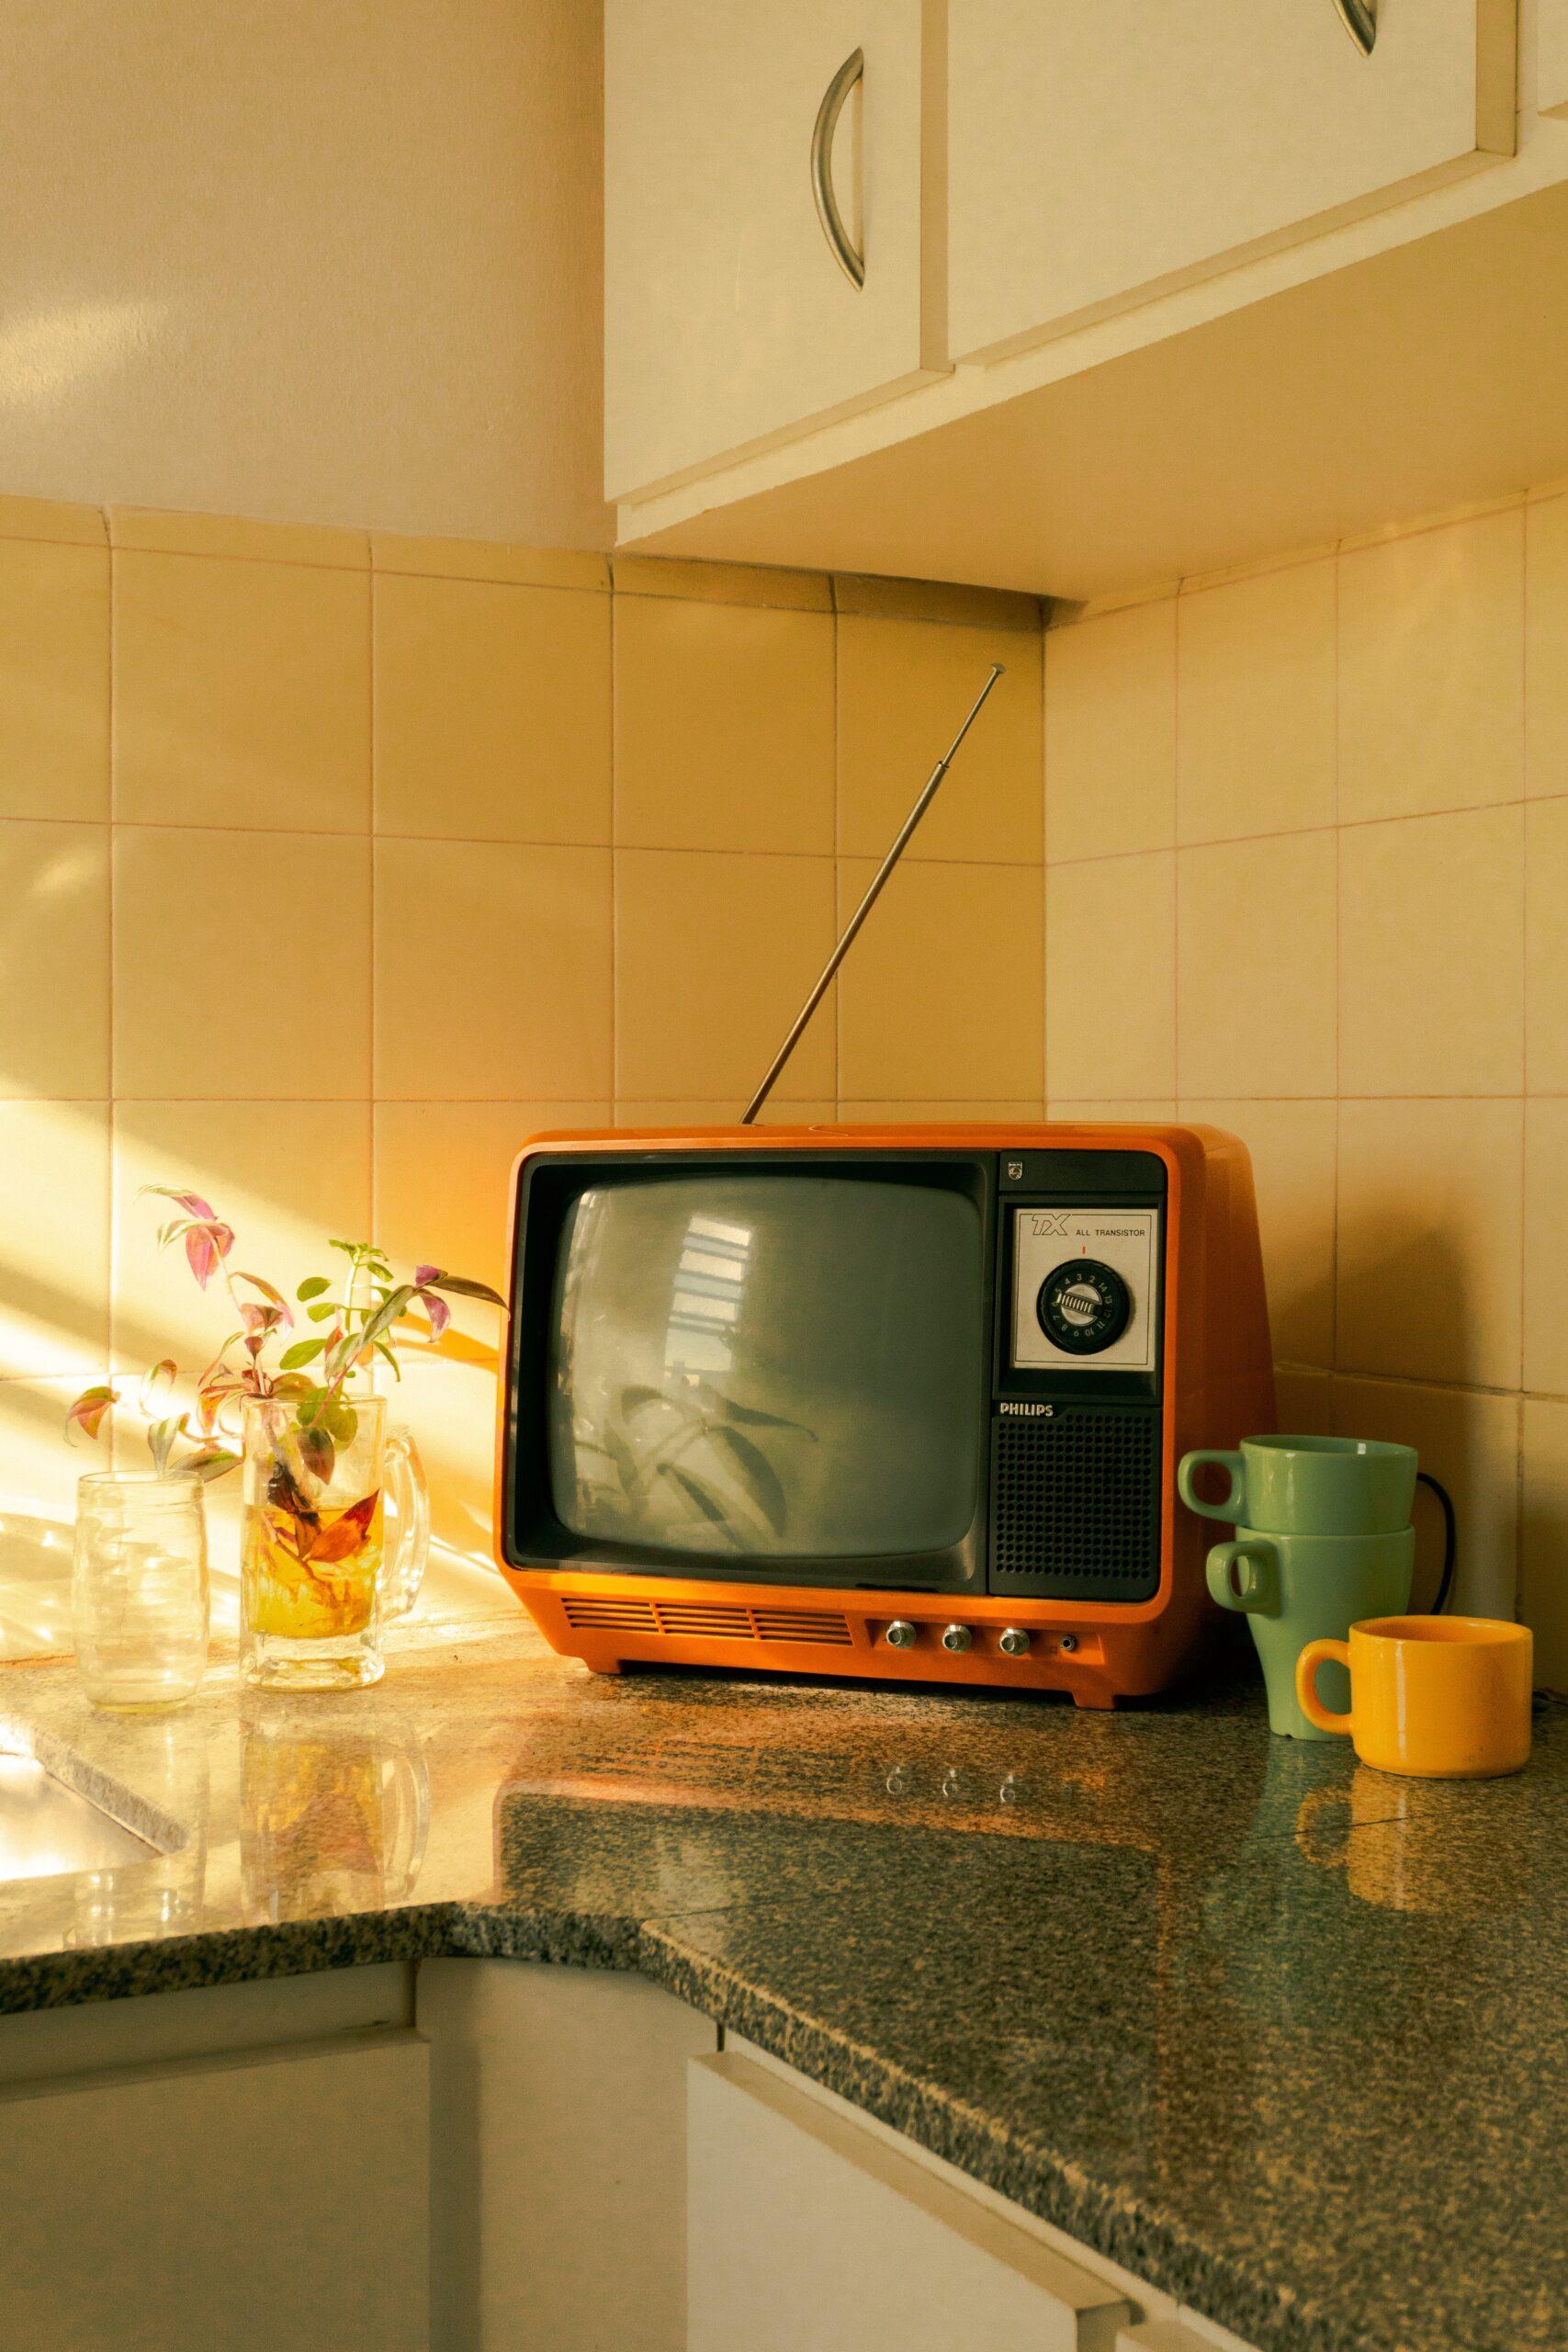 Orange Kitchen TV photo from Francisco Andreotti